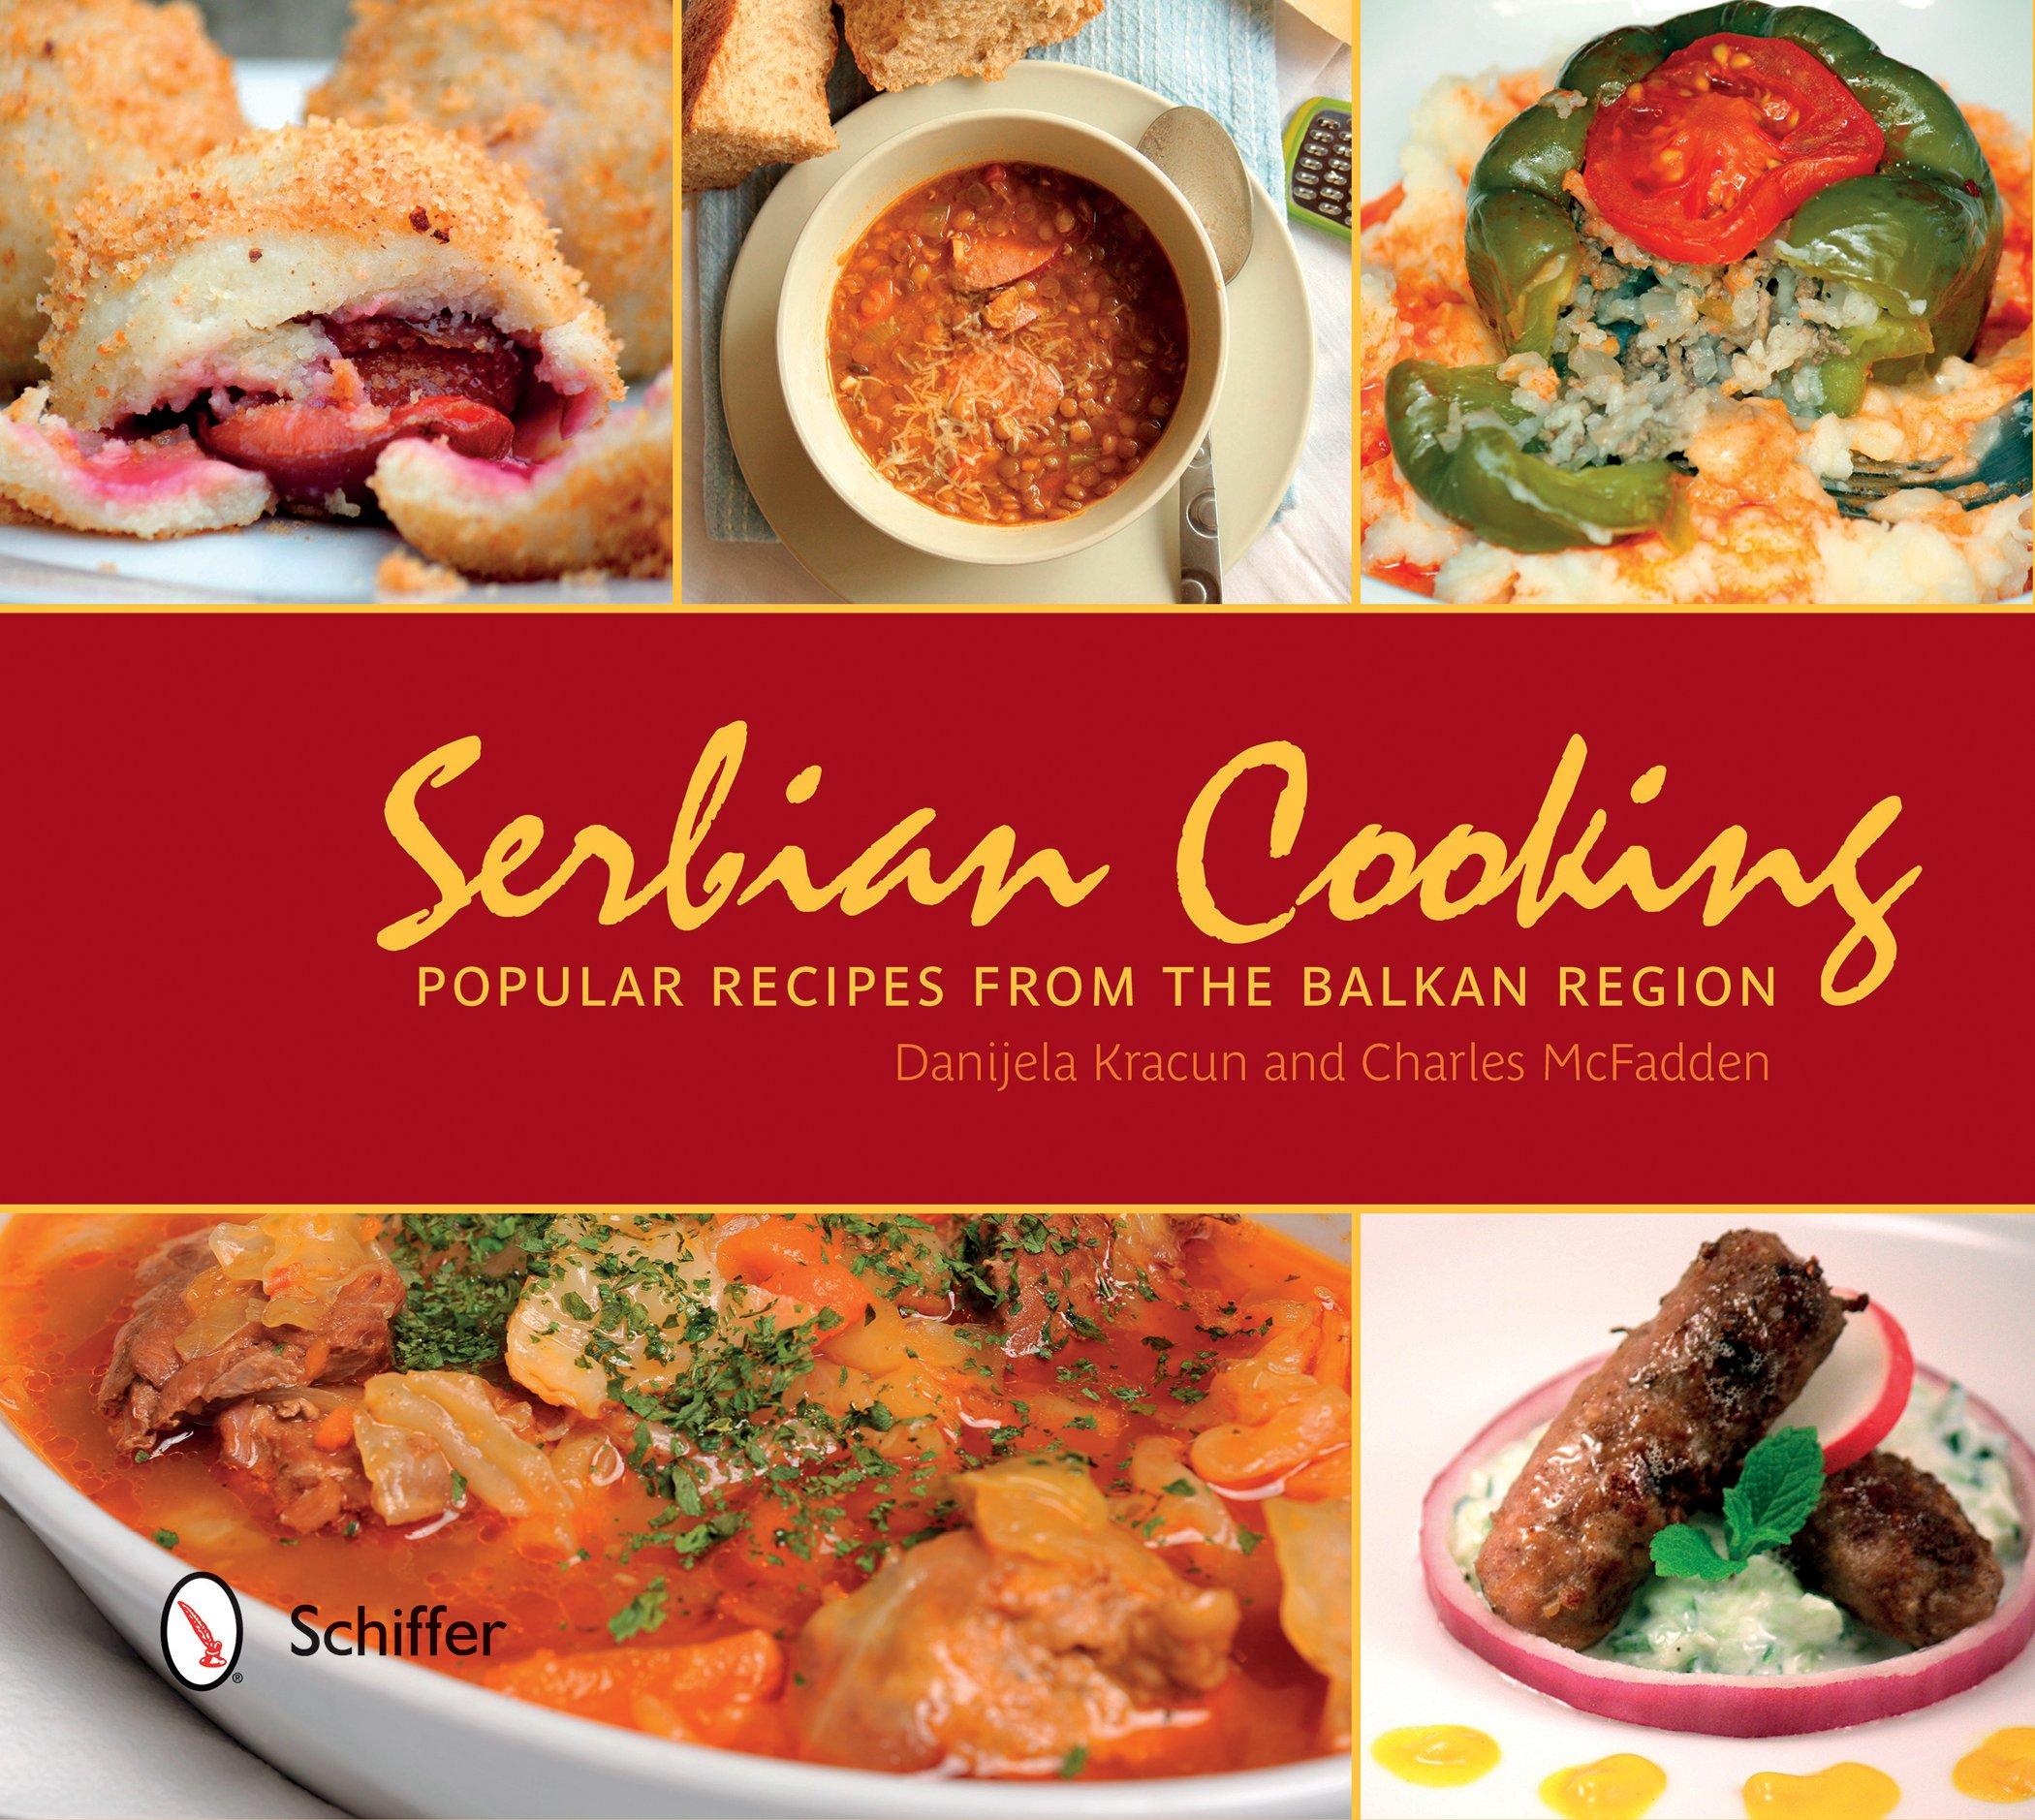 Popular traditional recipes